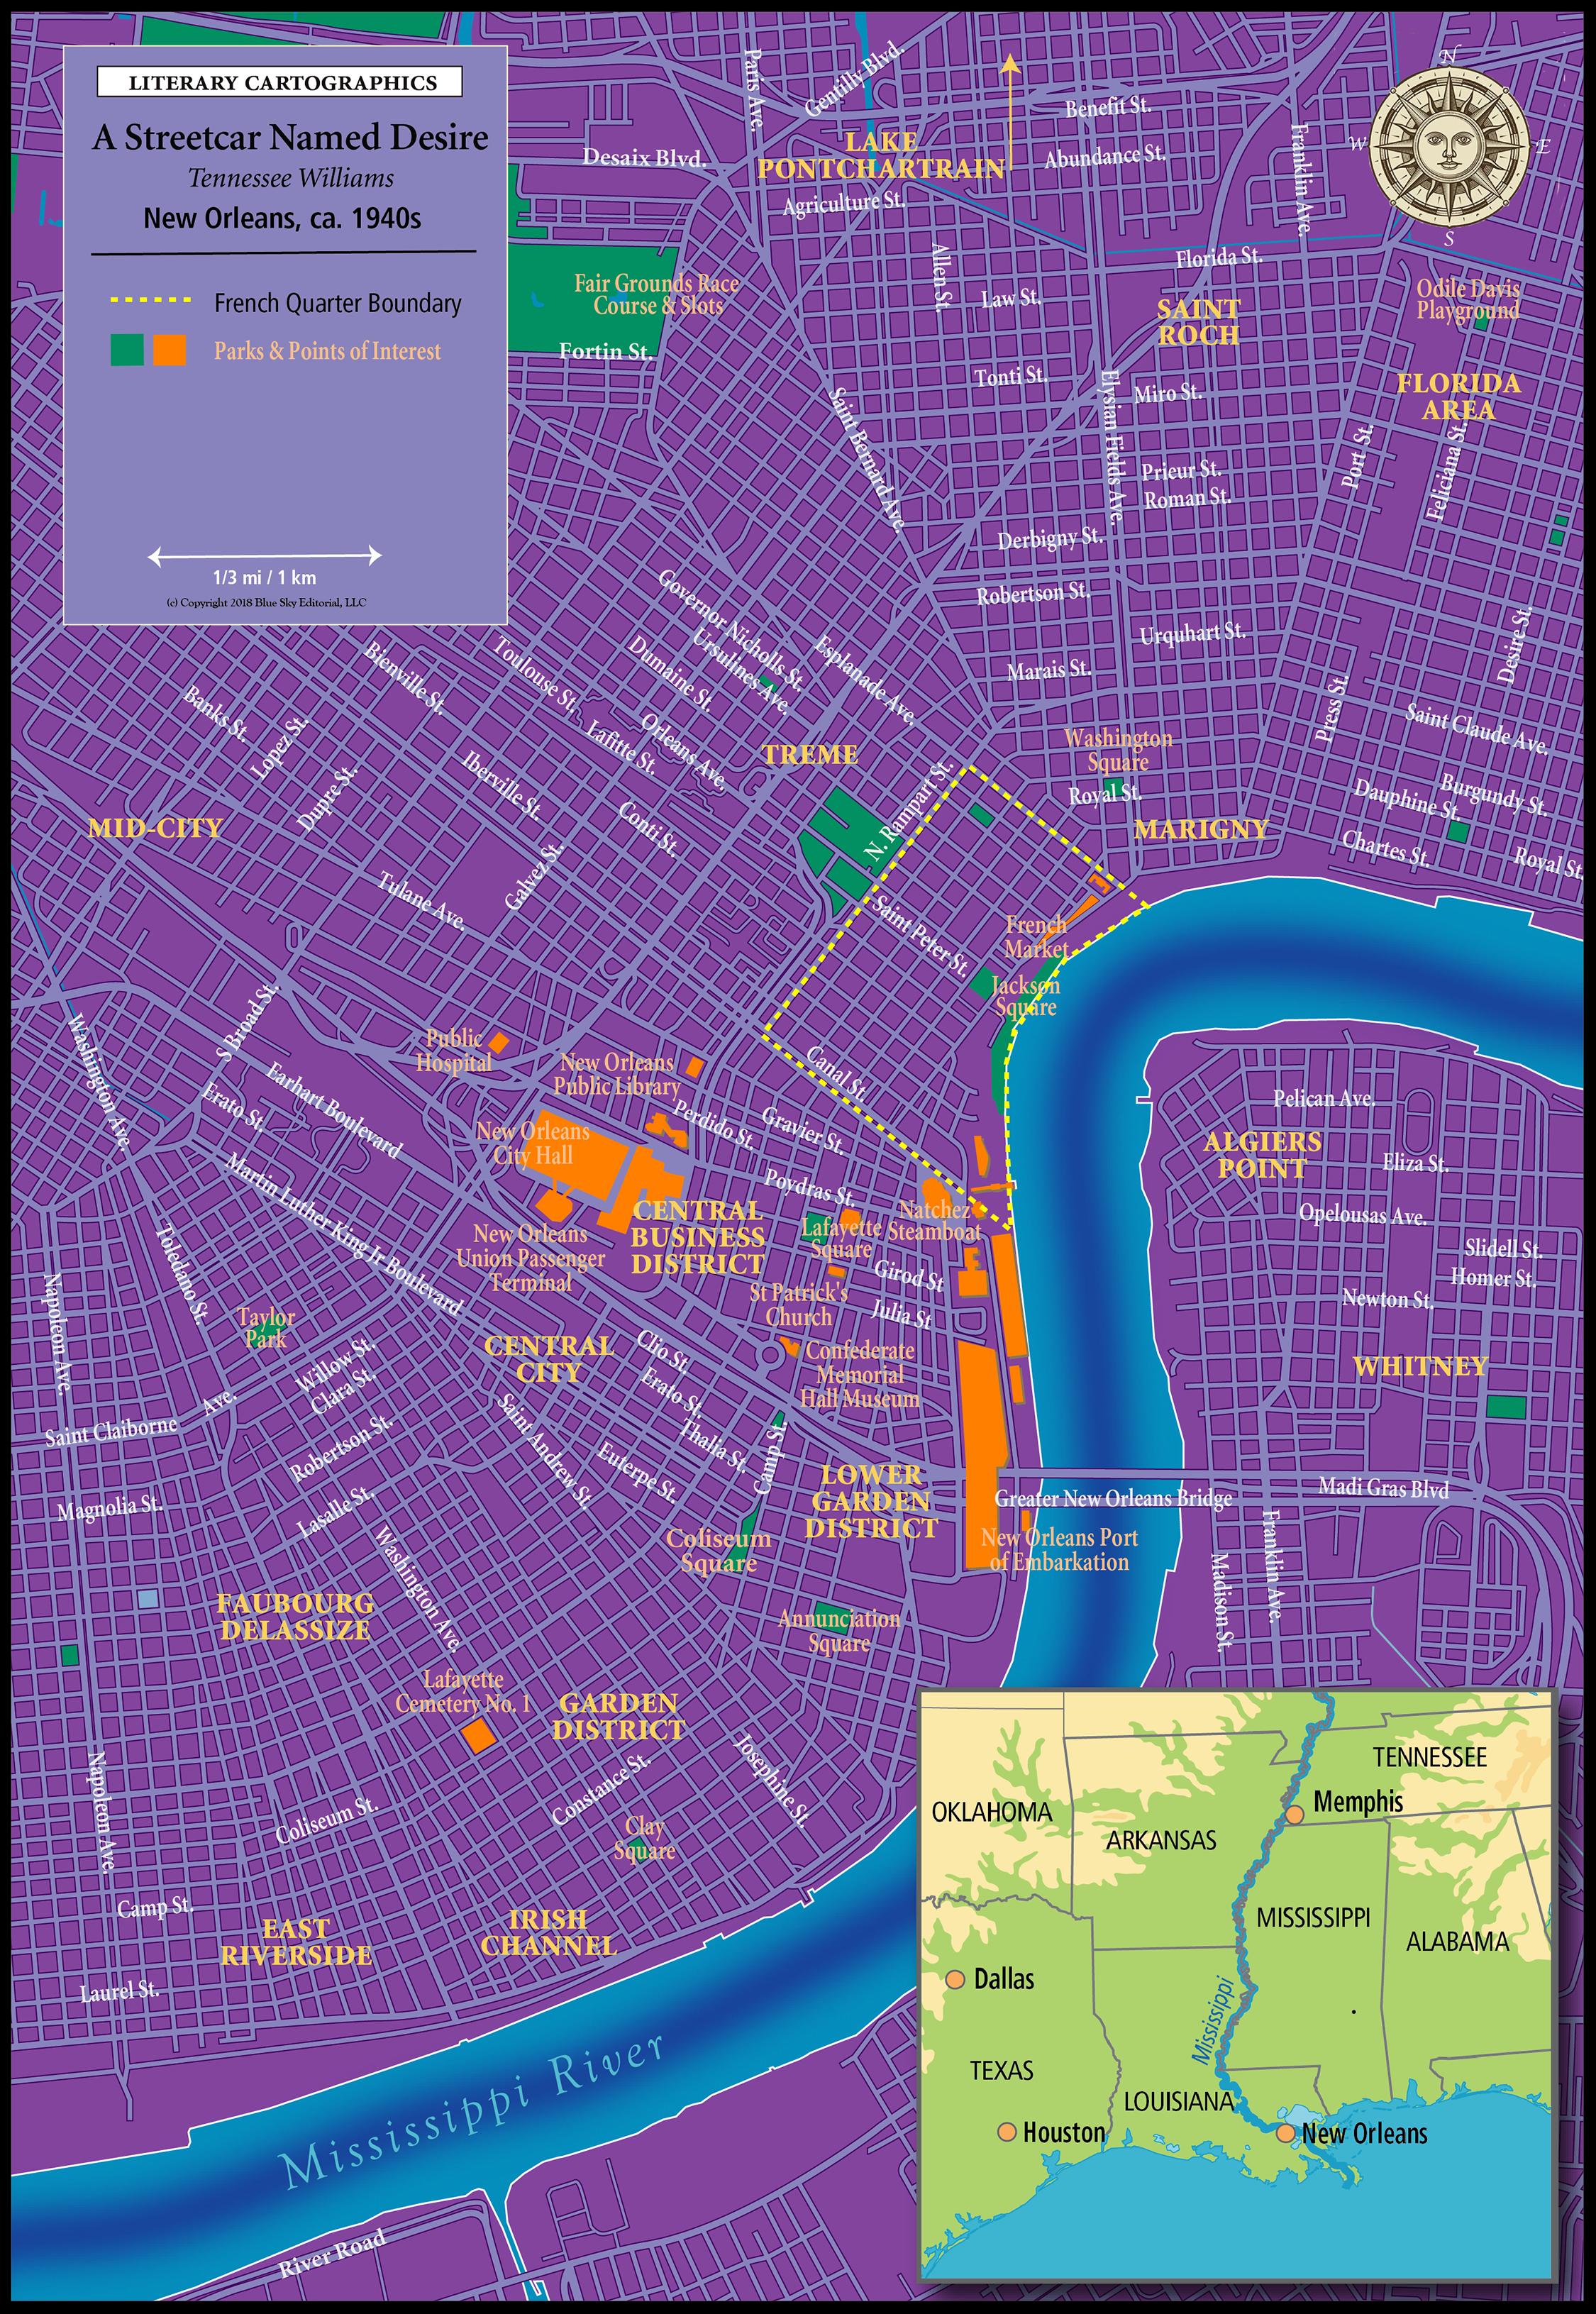 https://bucket4fury.s3.amazonaws.com/Streetcar+base+map15